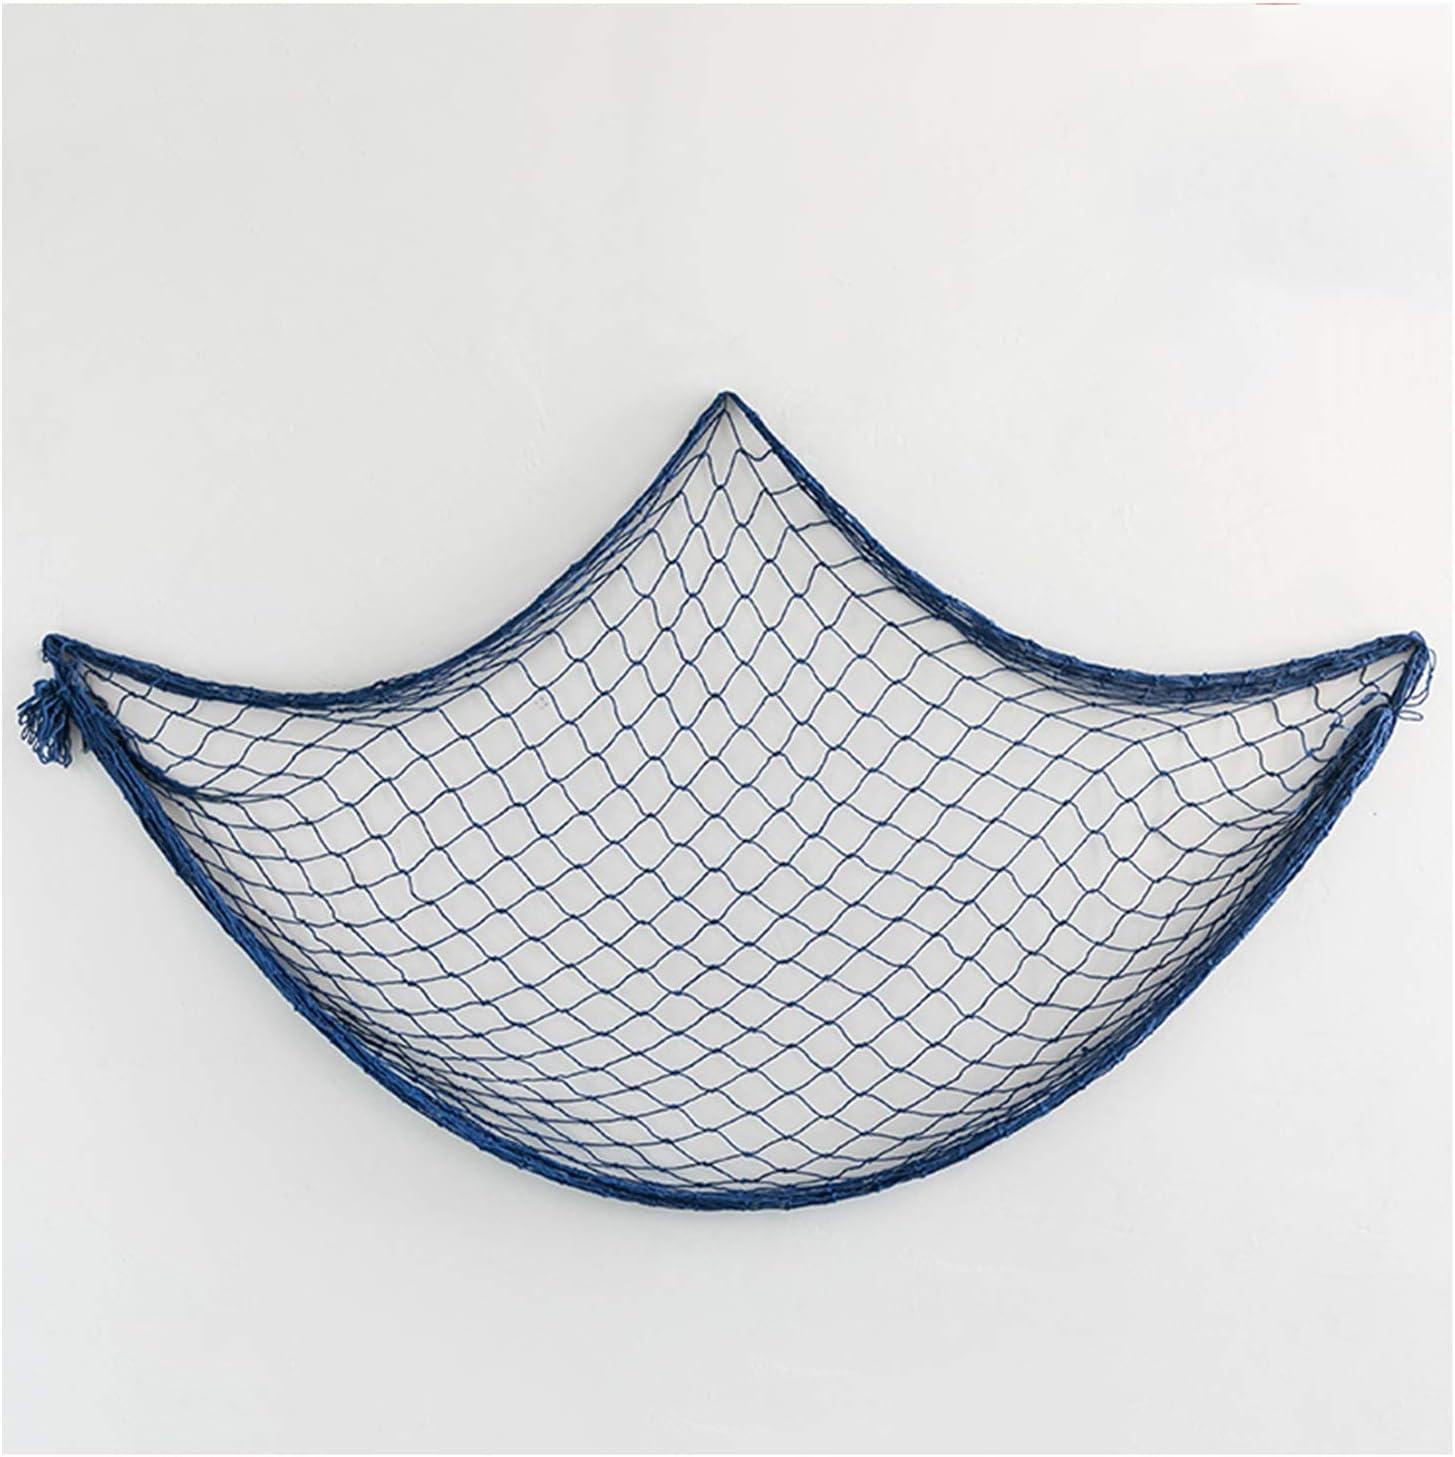 XXIOJUN Photo Decoration Net Fishing E Max 52% OFF Creative Design with Over item handling